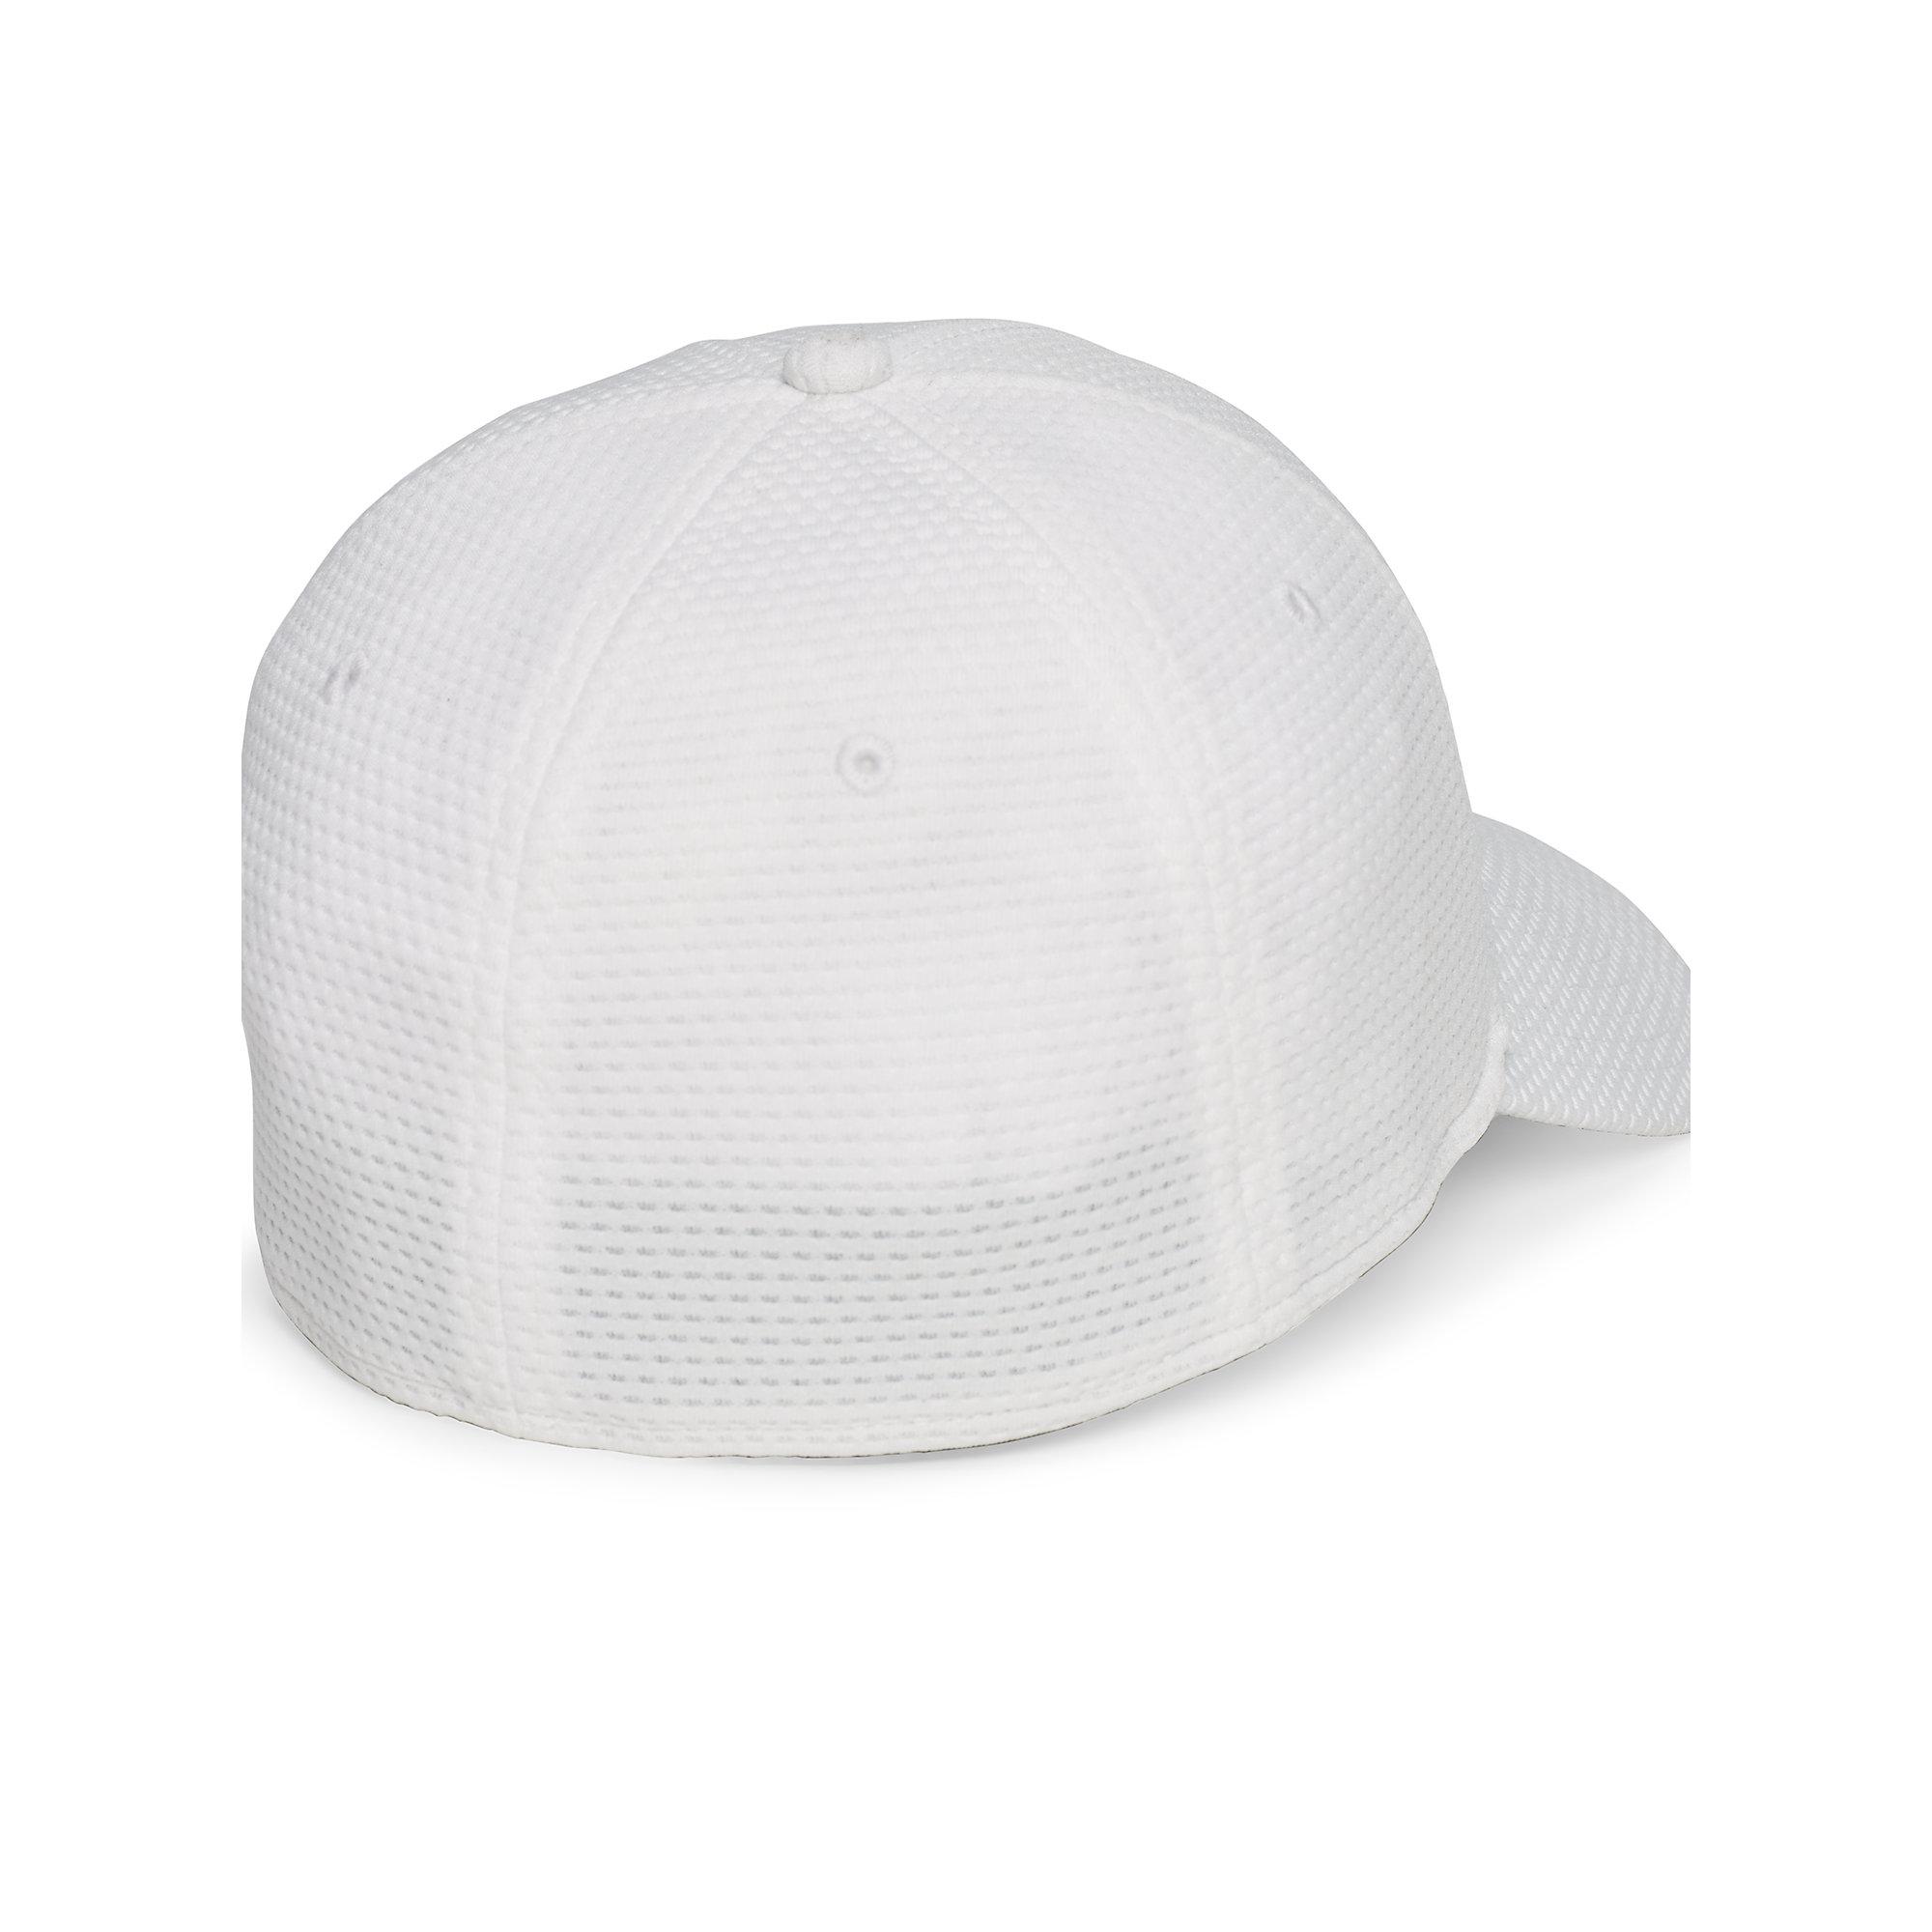 pink pony performance mesh cap in white for men lyst. Black Bedroom Furniture Sets. Home Design Ideas